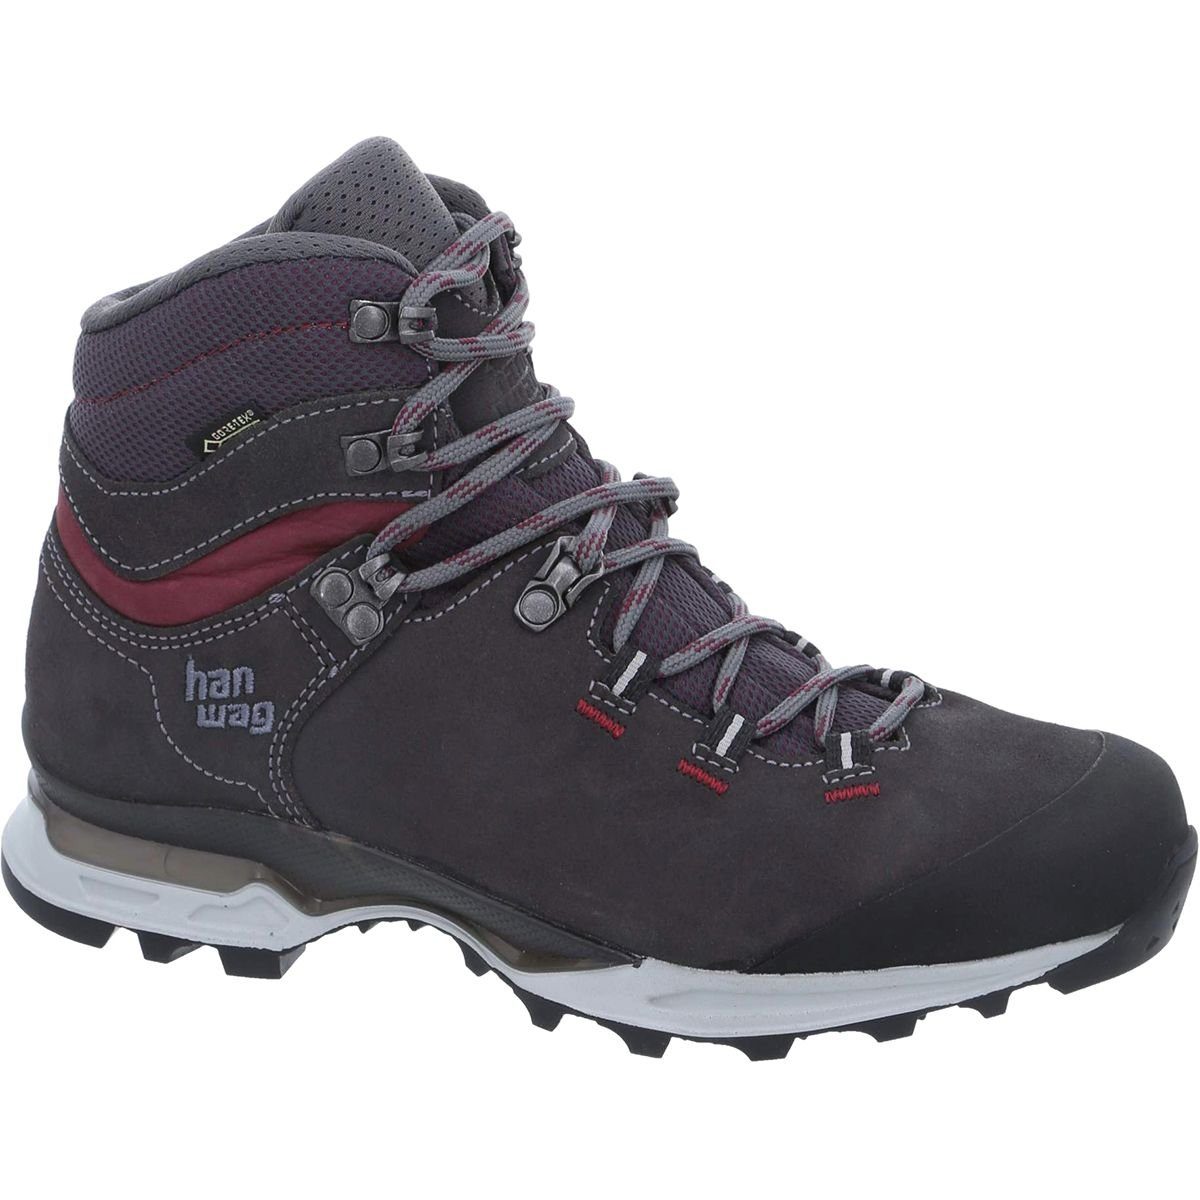 Hanwag Tatra Light Lady GTX Backpacking Boot - Womens, Asphalt/Dark Garnet, H202501-64356-8.5 by Hanwag